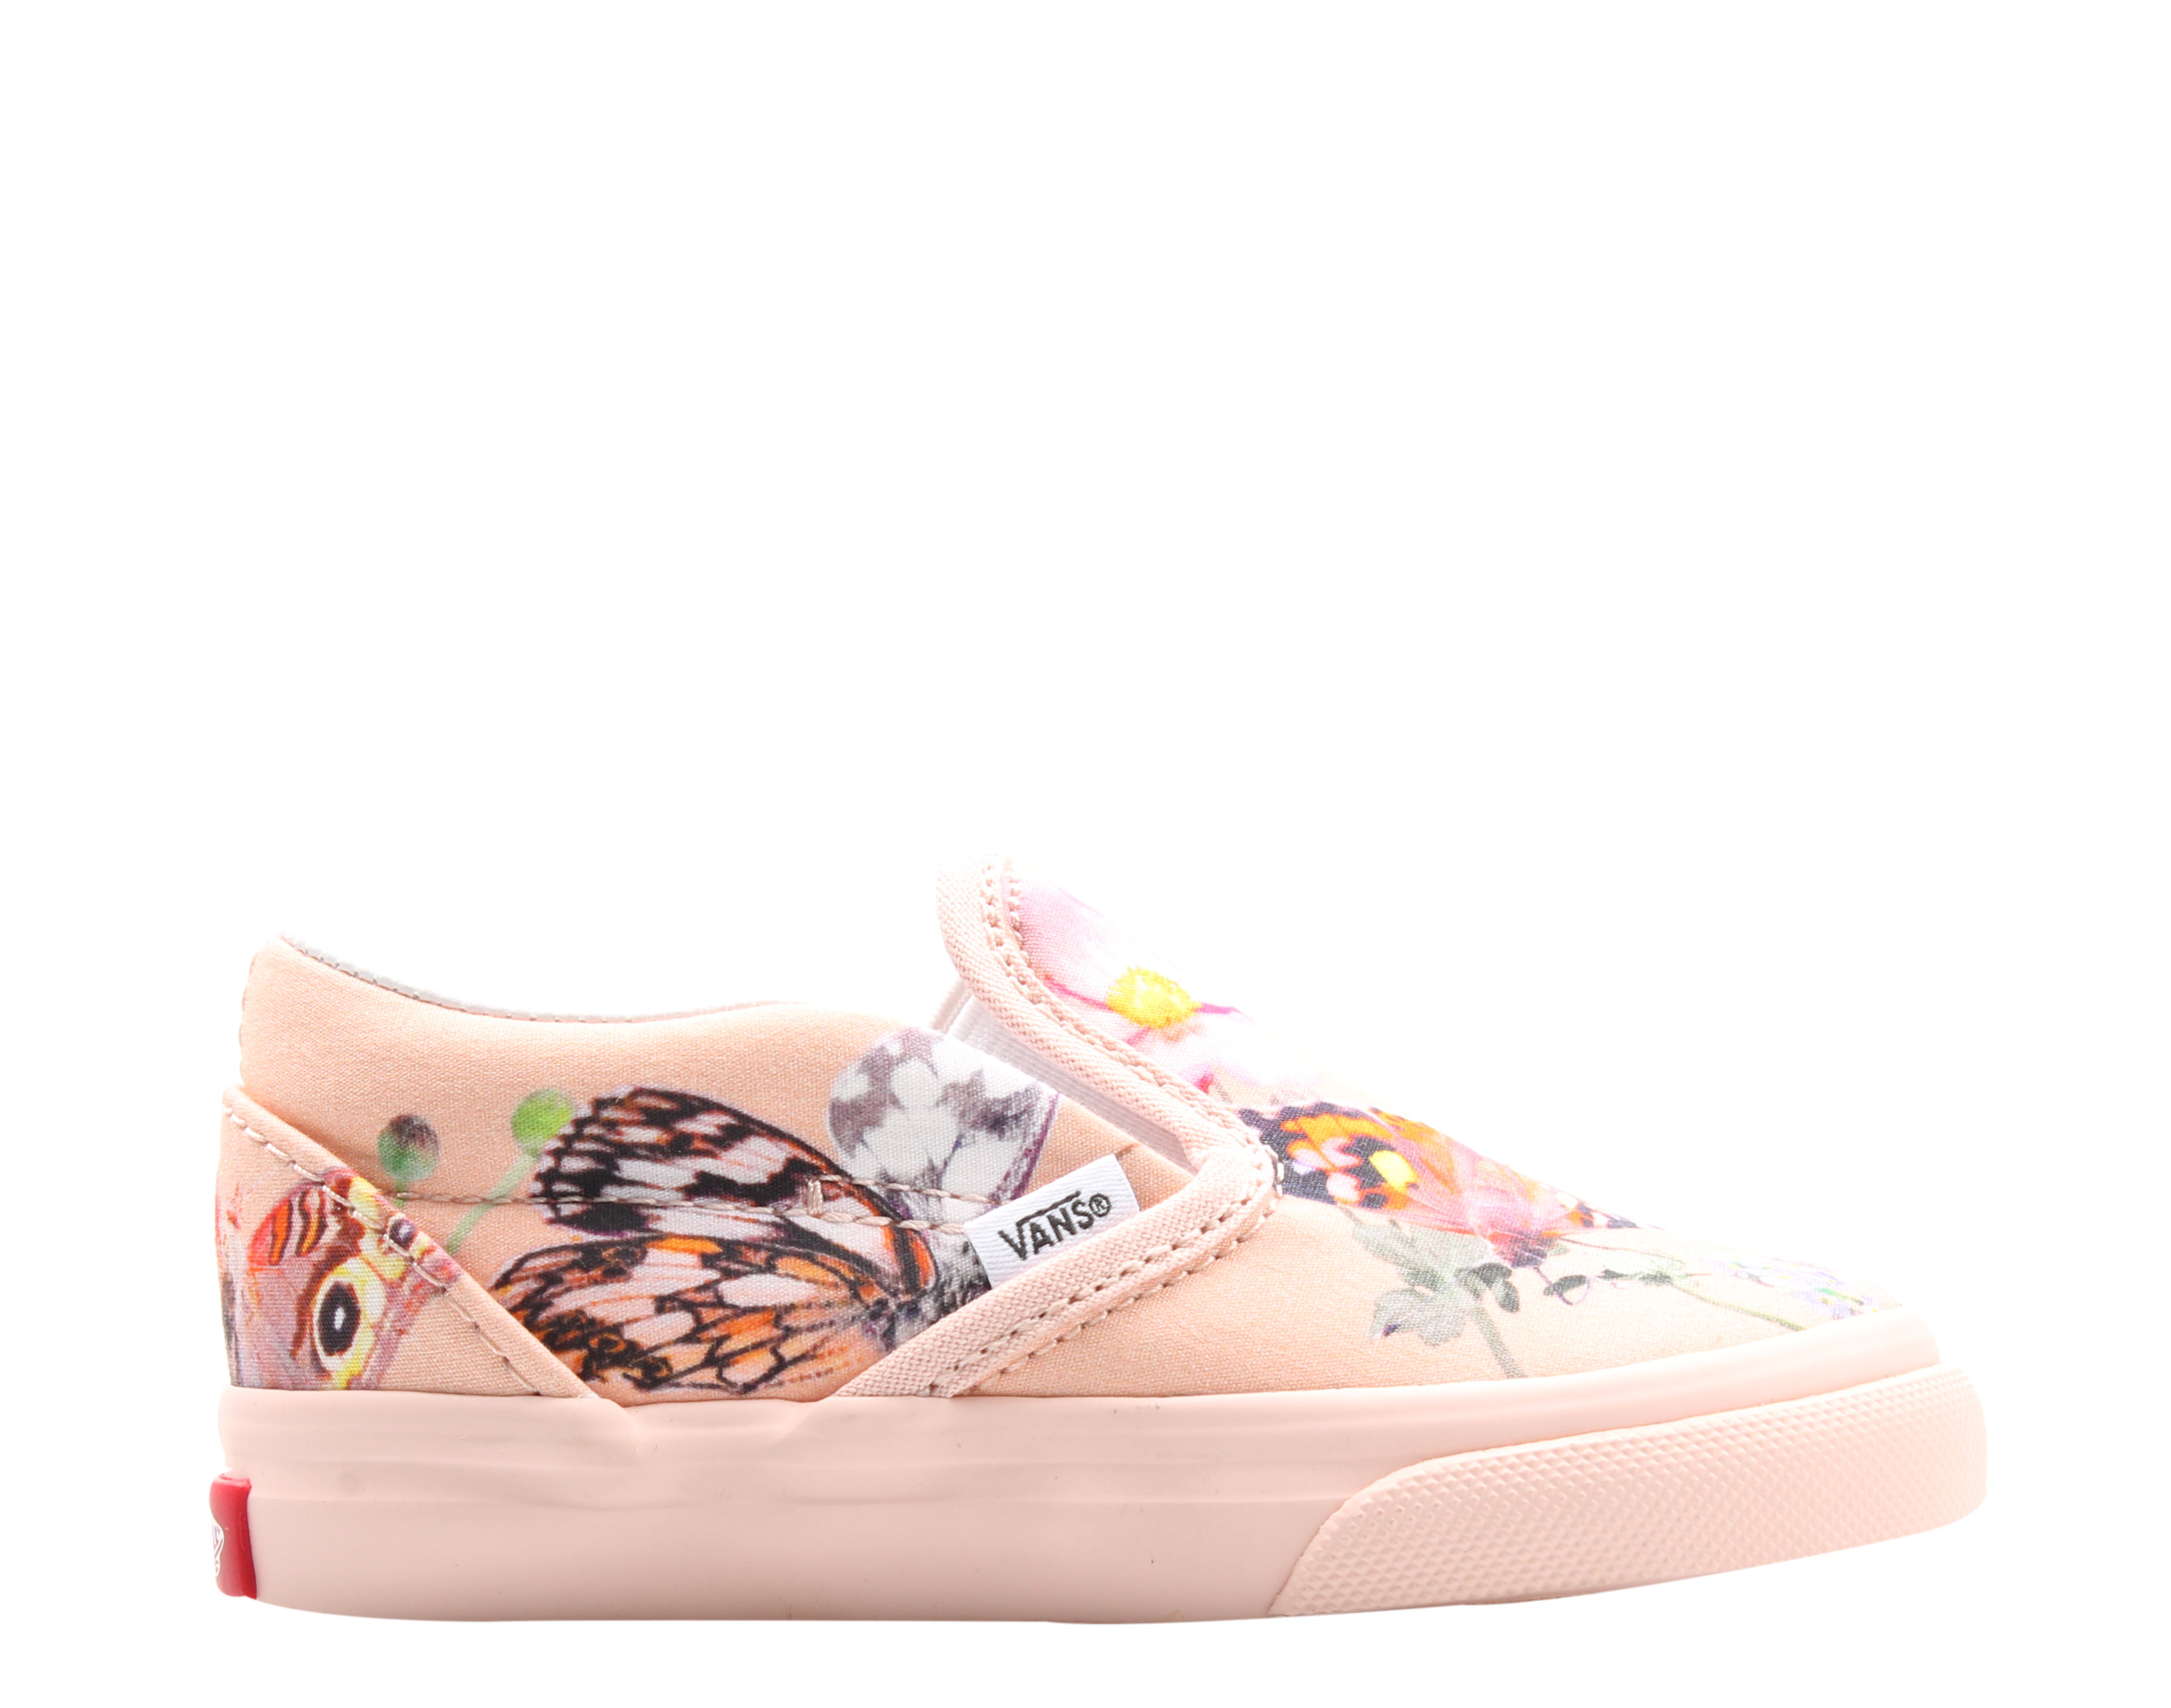 Vans x Molo Classic Slip-On Butterflies